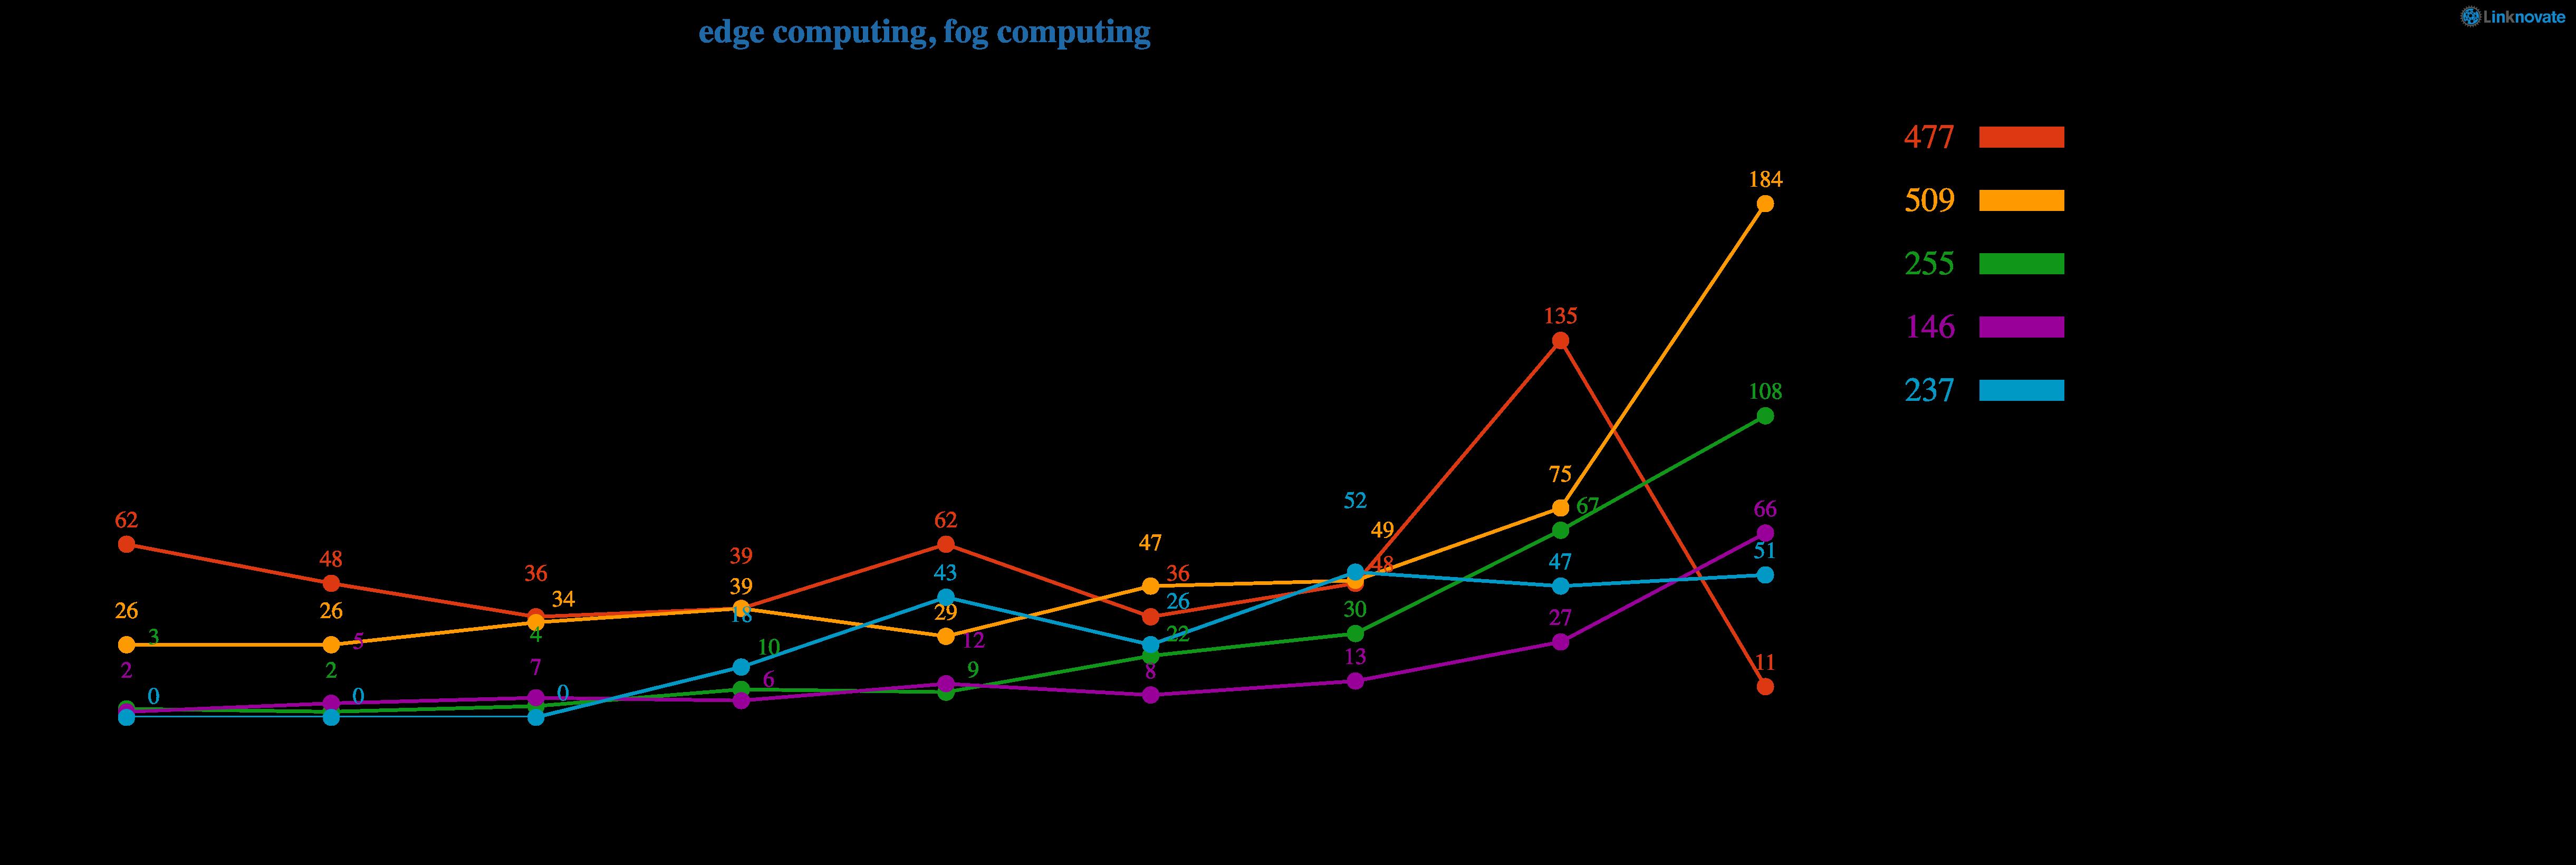 Edge Computing Leaders